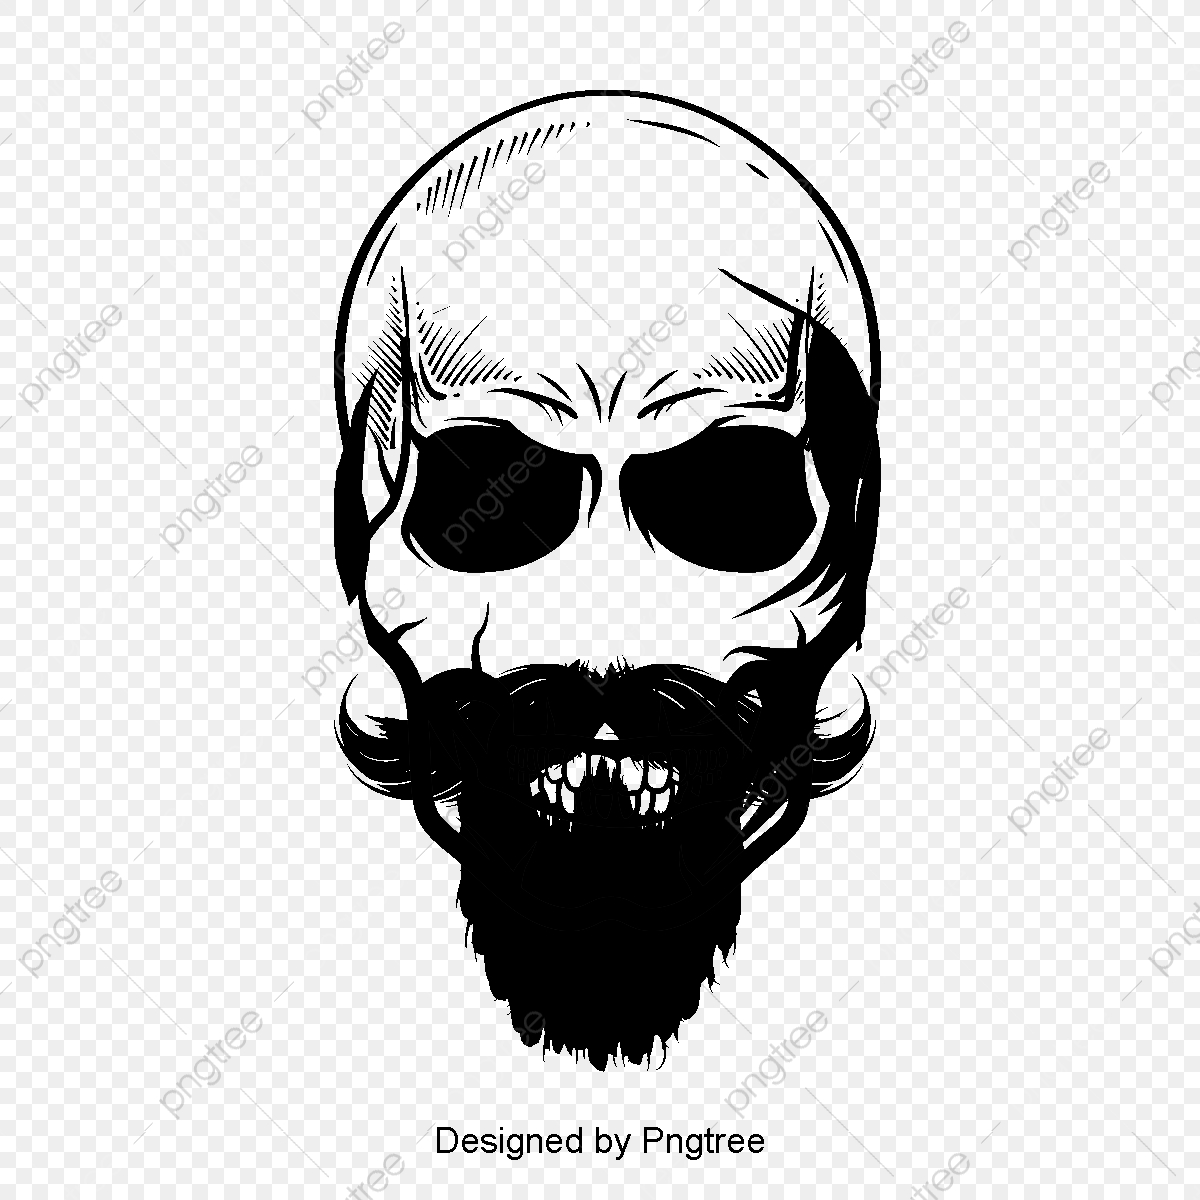 Vector Bearded Skull, Skull, Bone Material, Skull PNG Transparent.